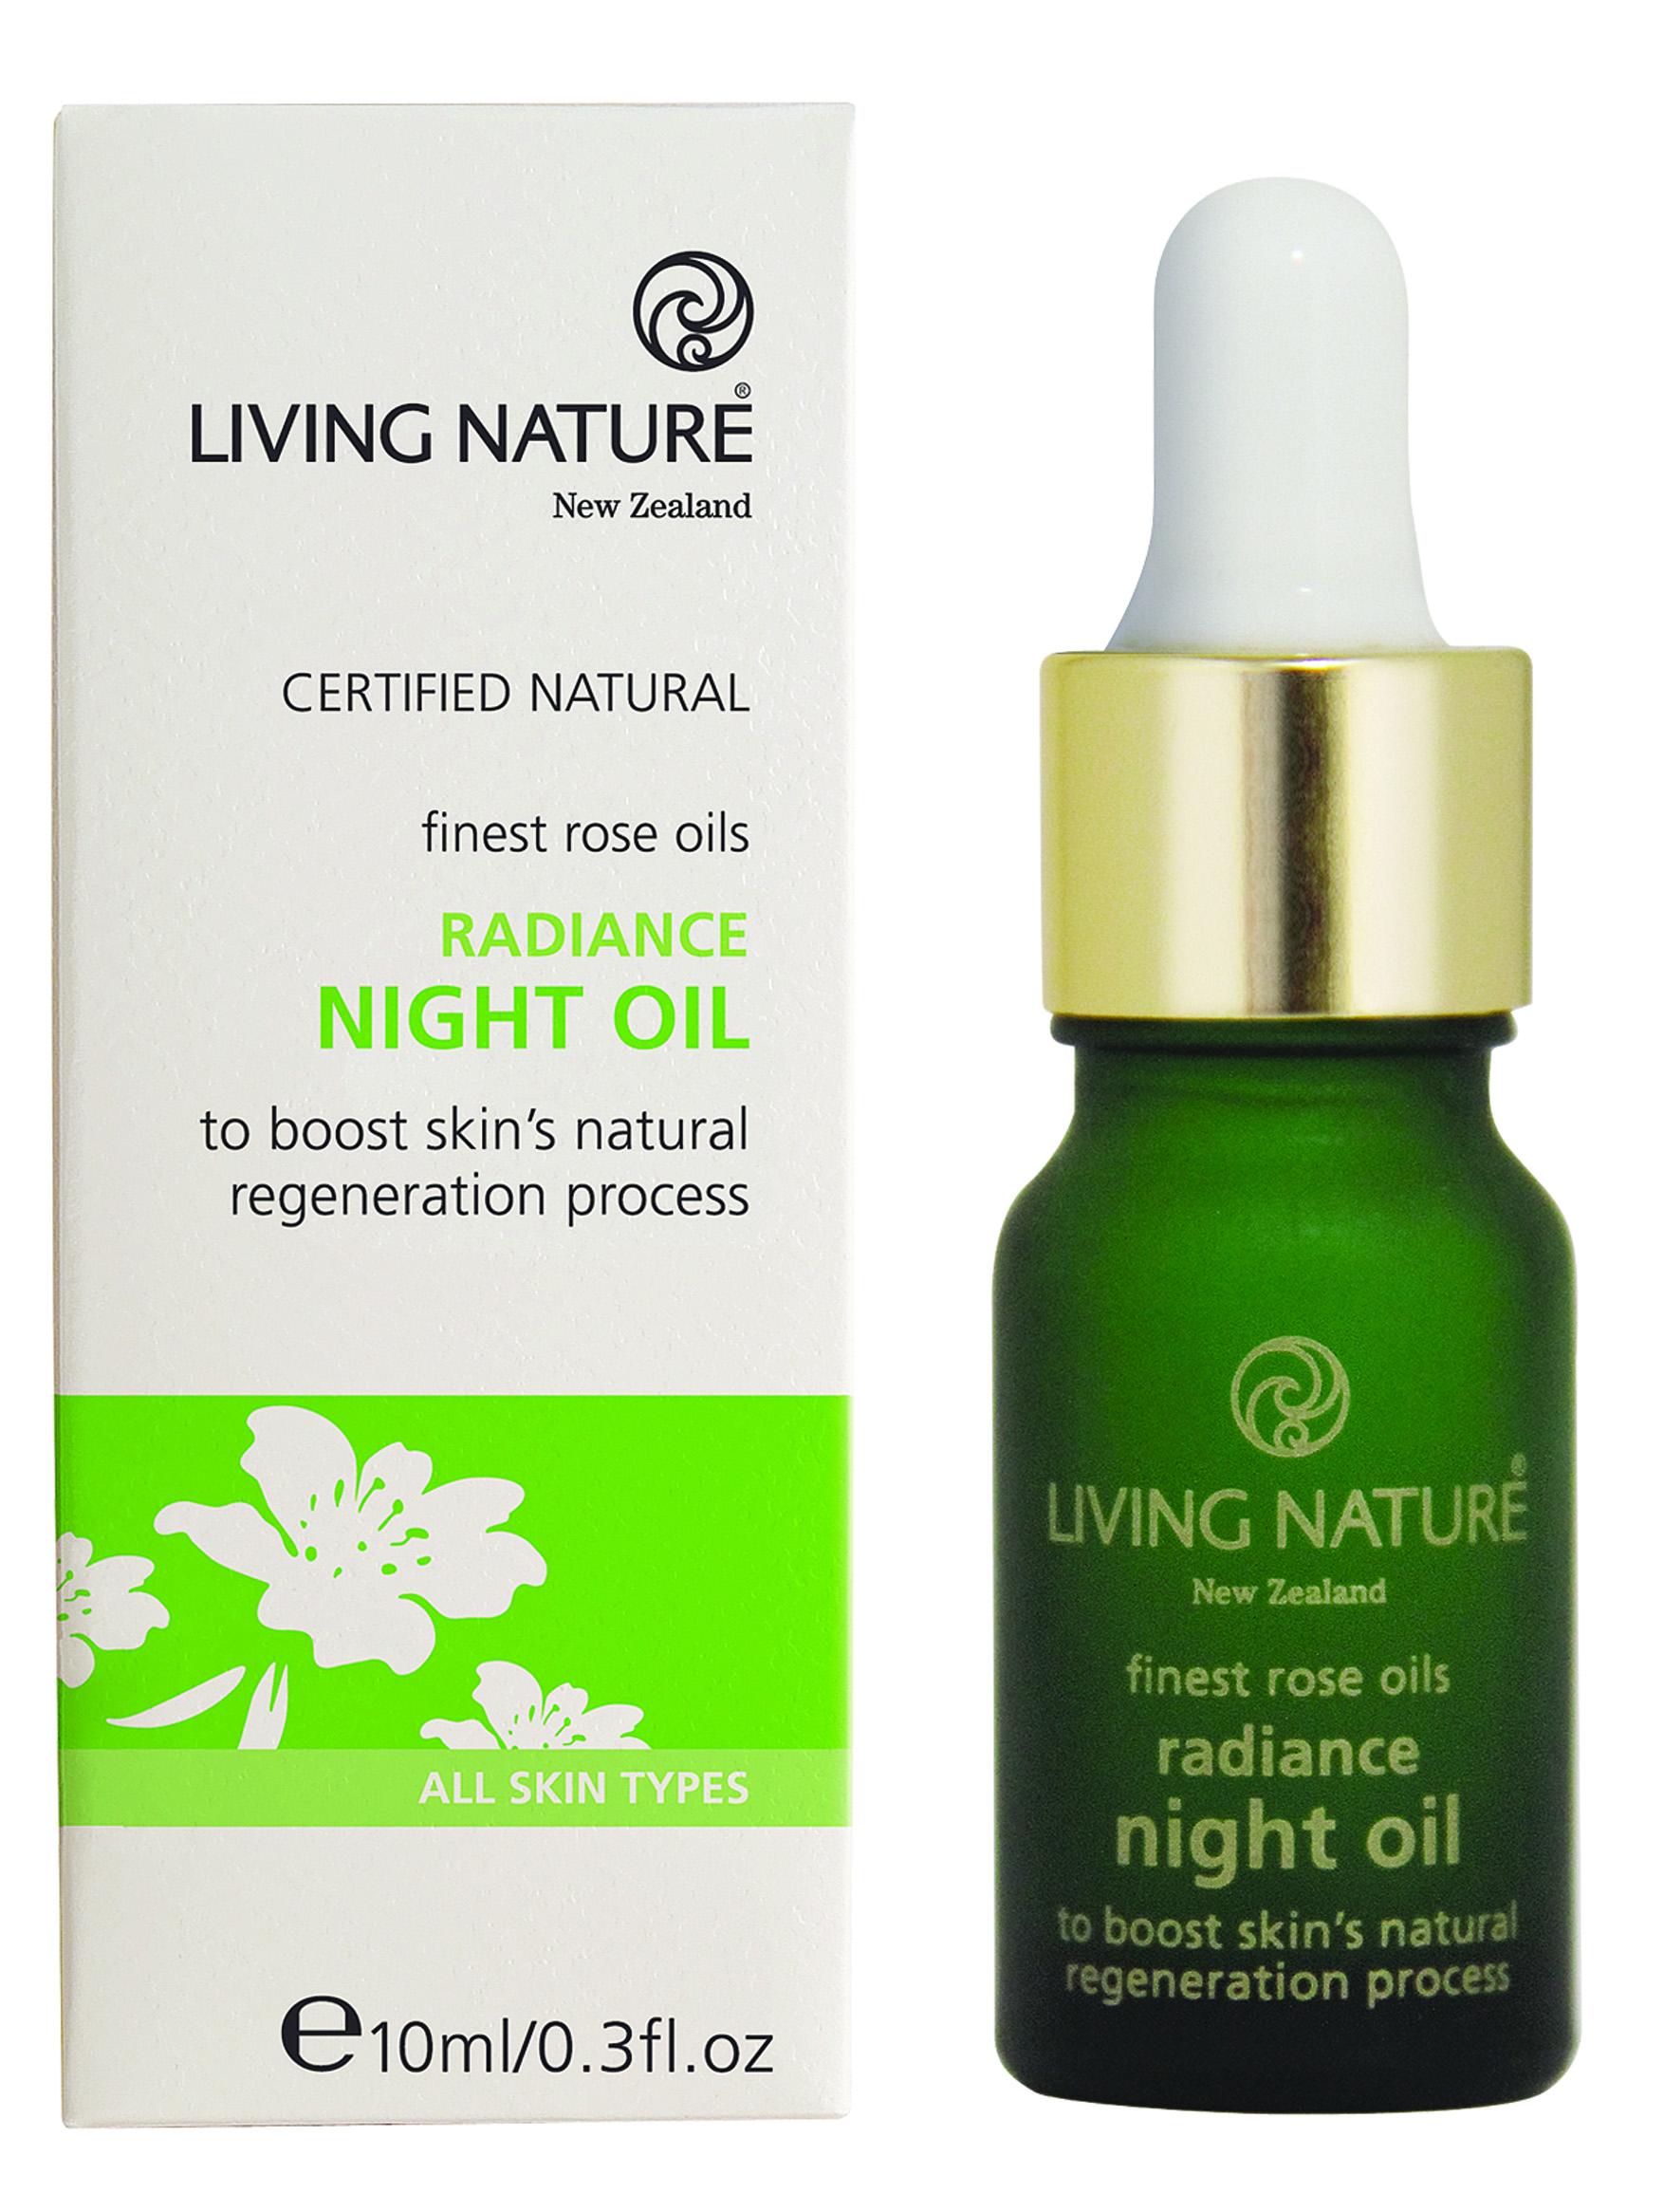 Radiance Night oil